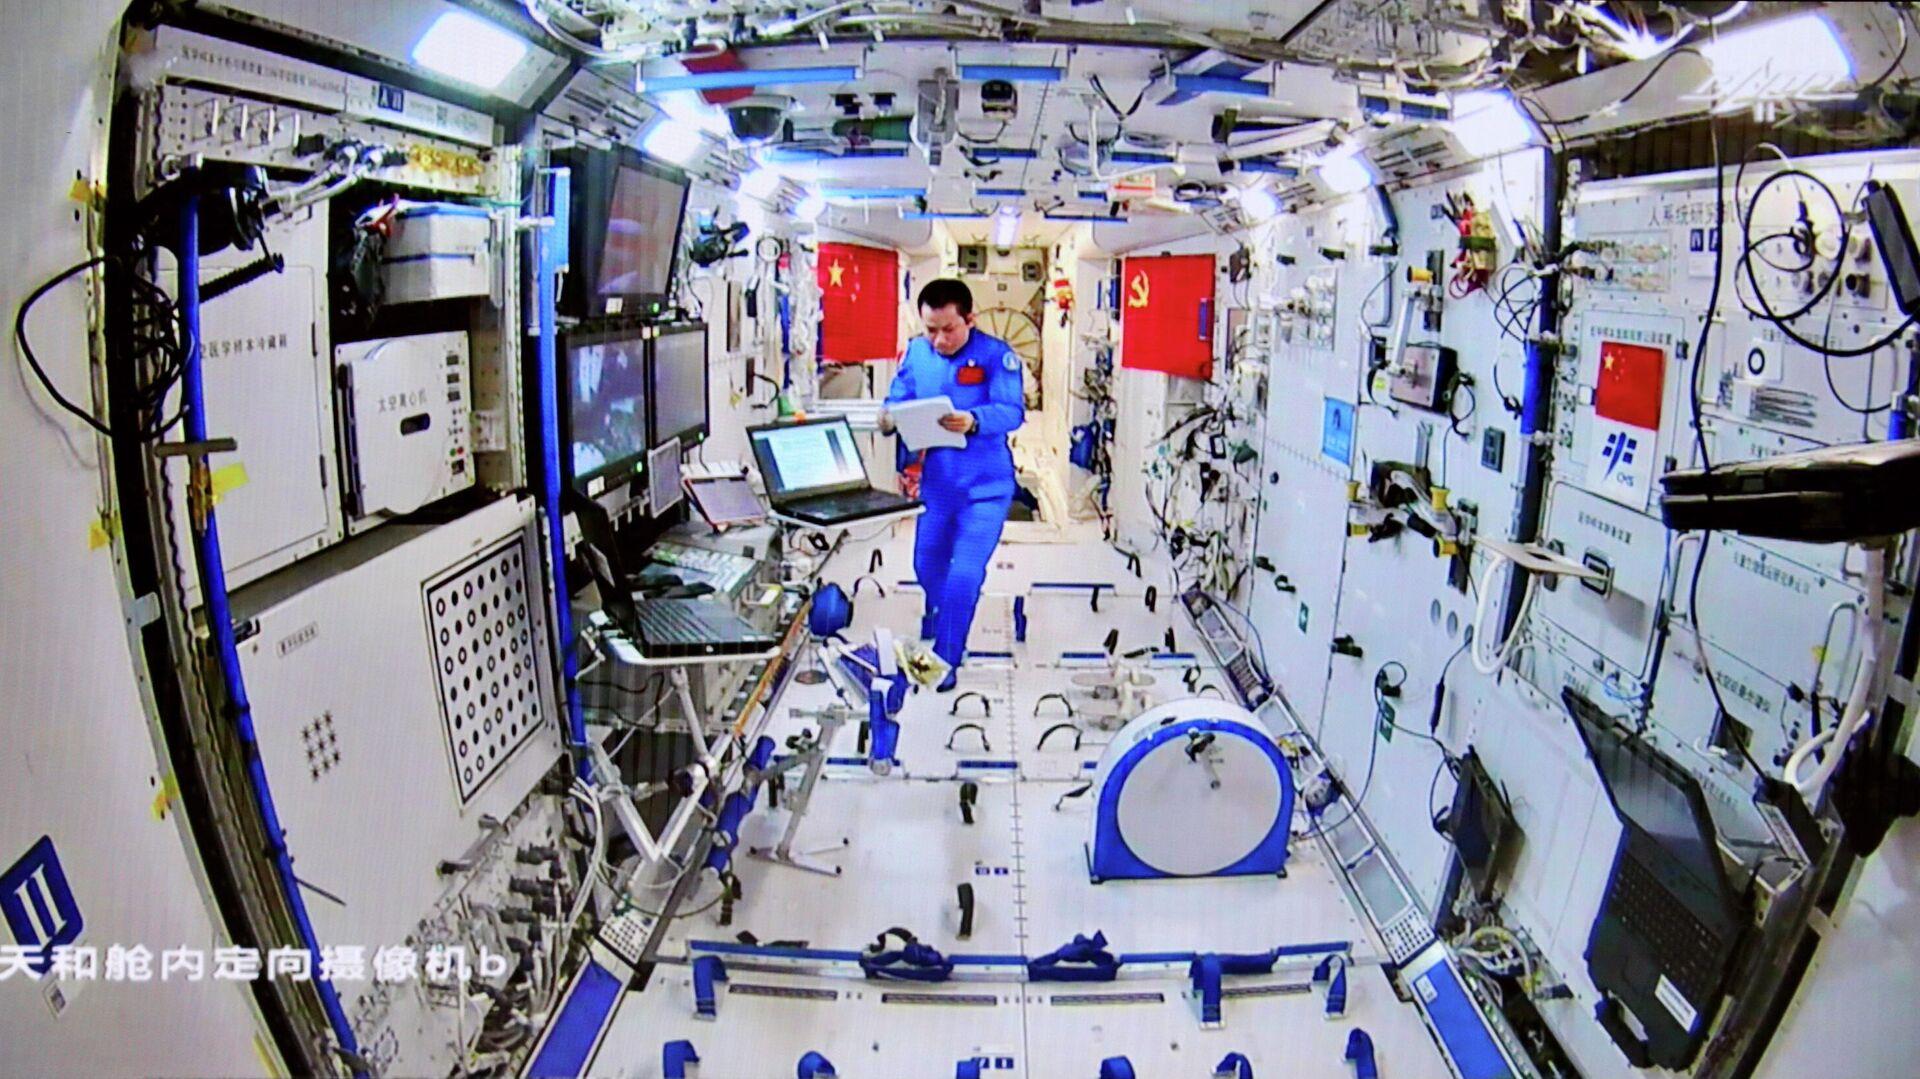 Un astronauta chino en la nave Shenzhou-12 - Sputnik Mundo, 1920, 16.09.2021